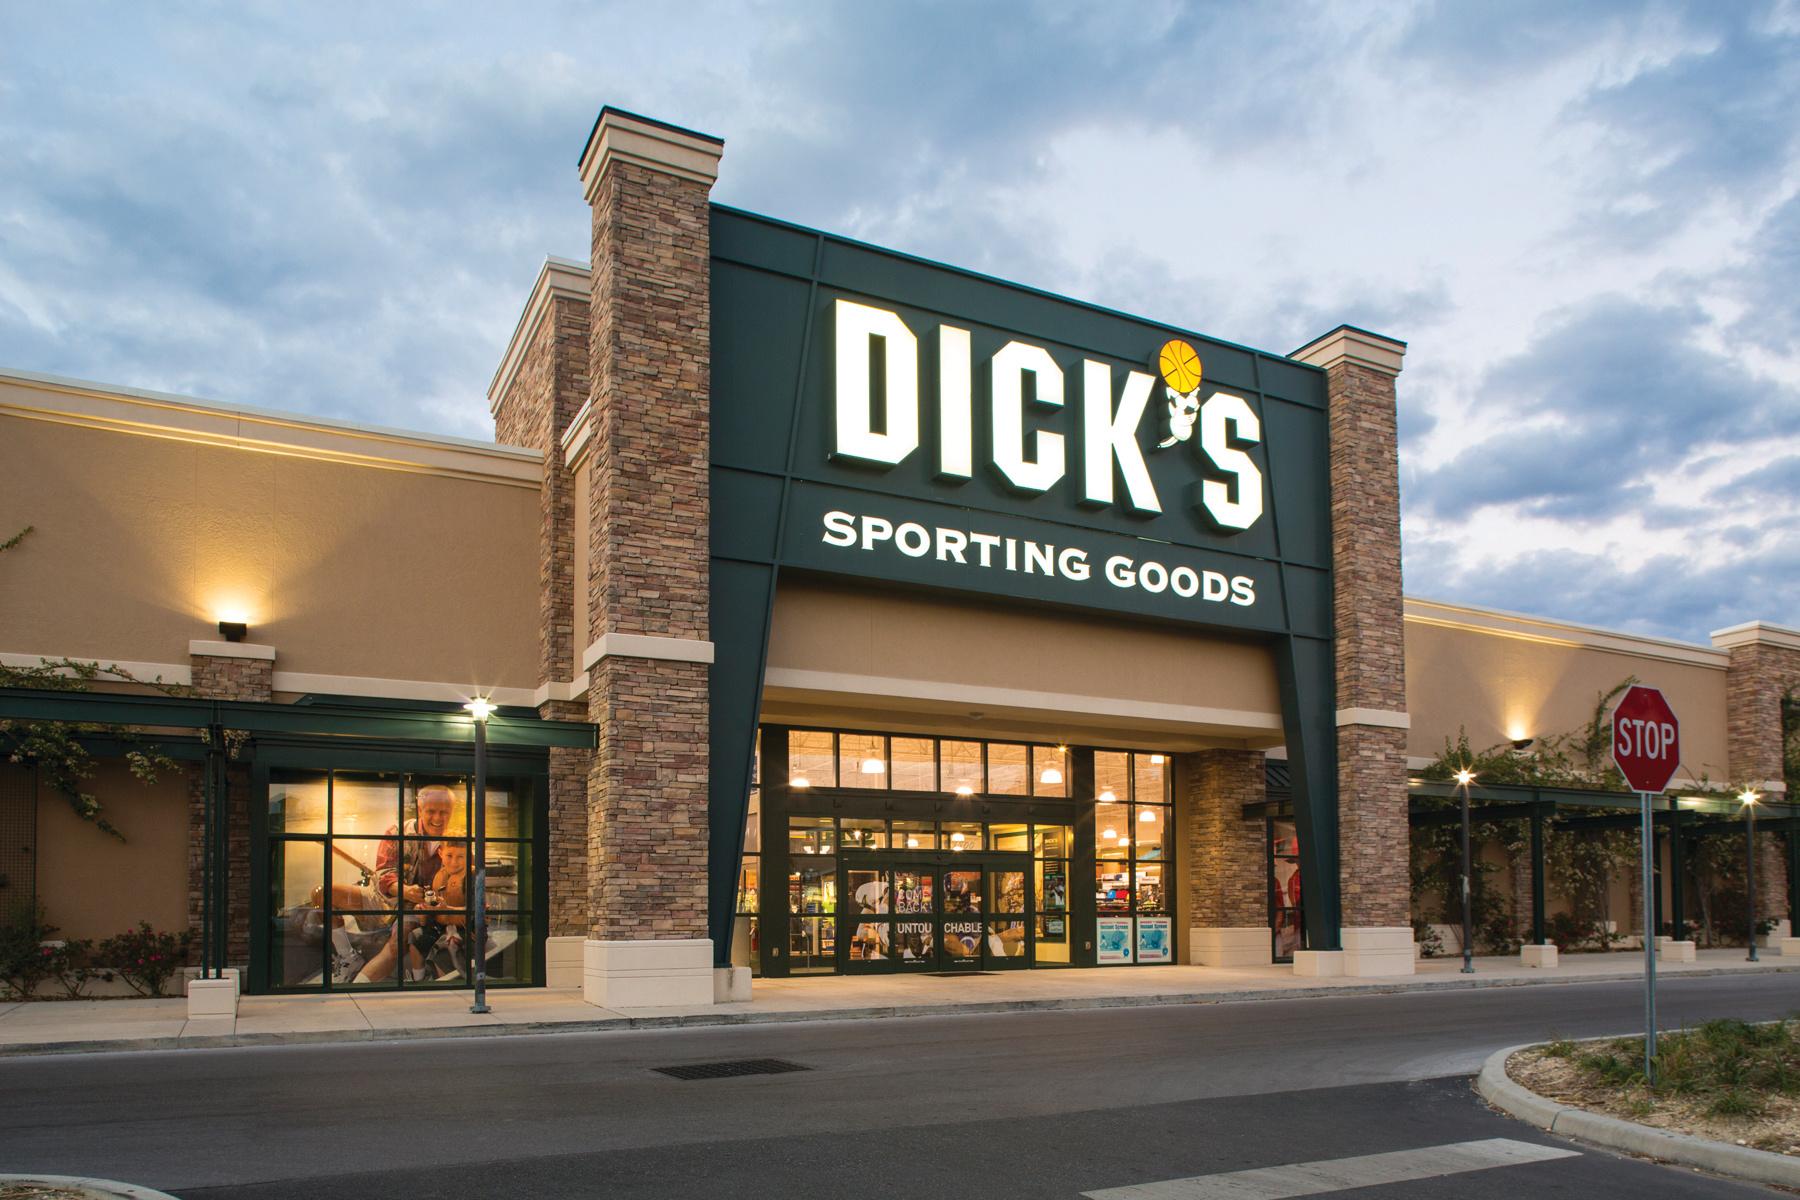 Dicks sporting goods in hobart indiana